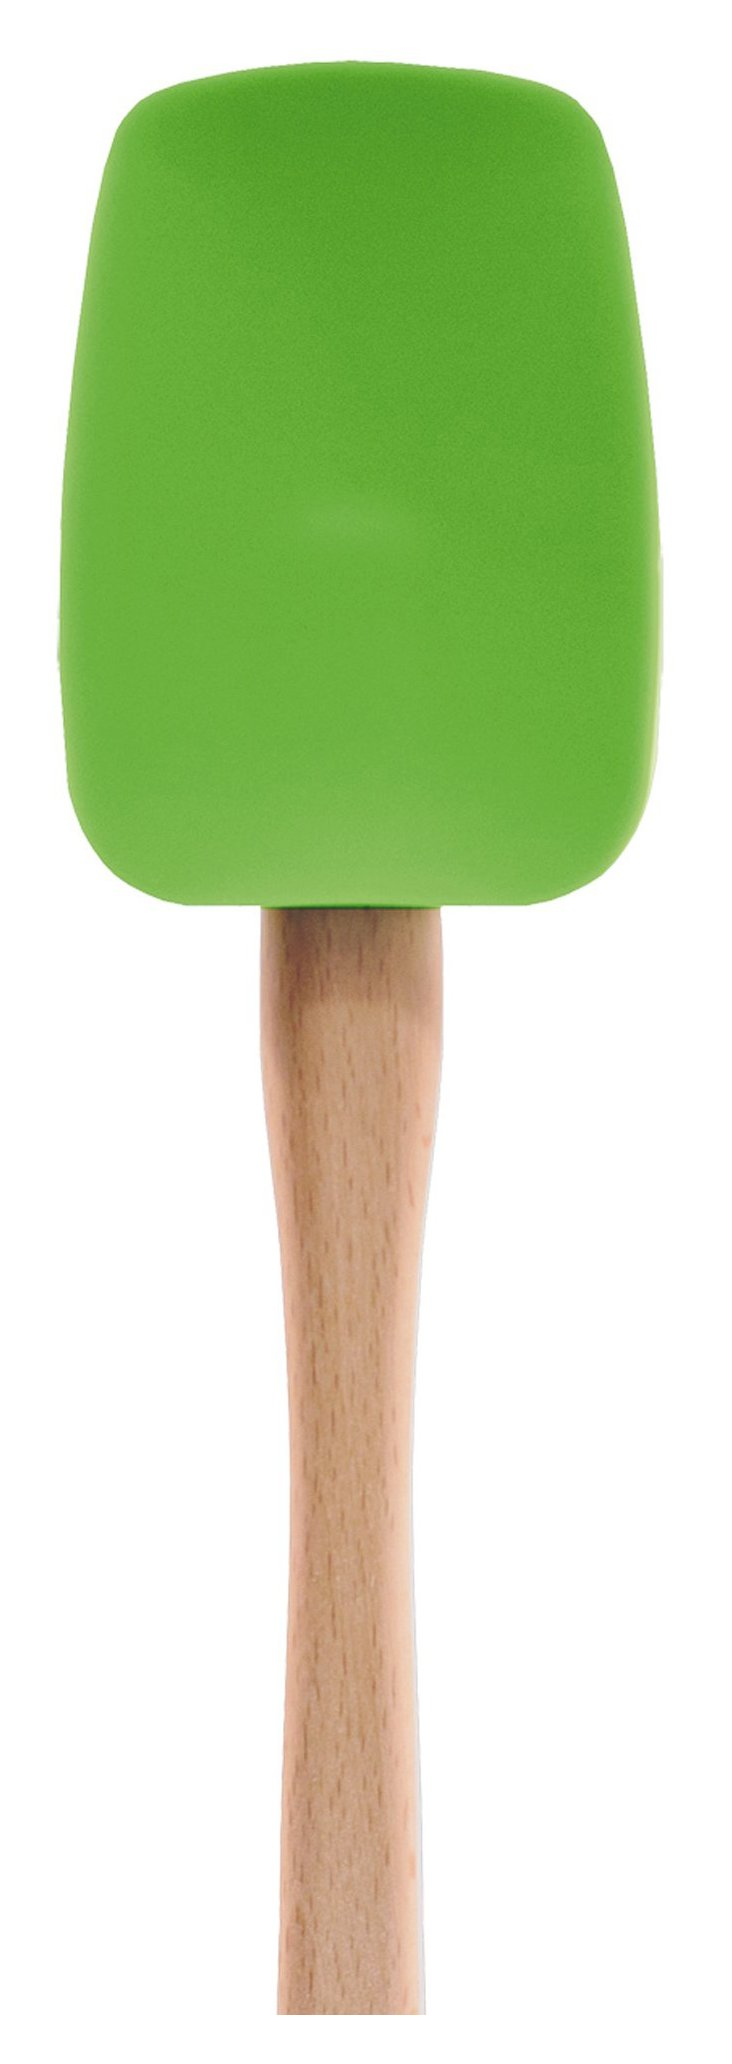 S/2 Silicone Spoonulas, Lime